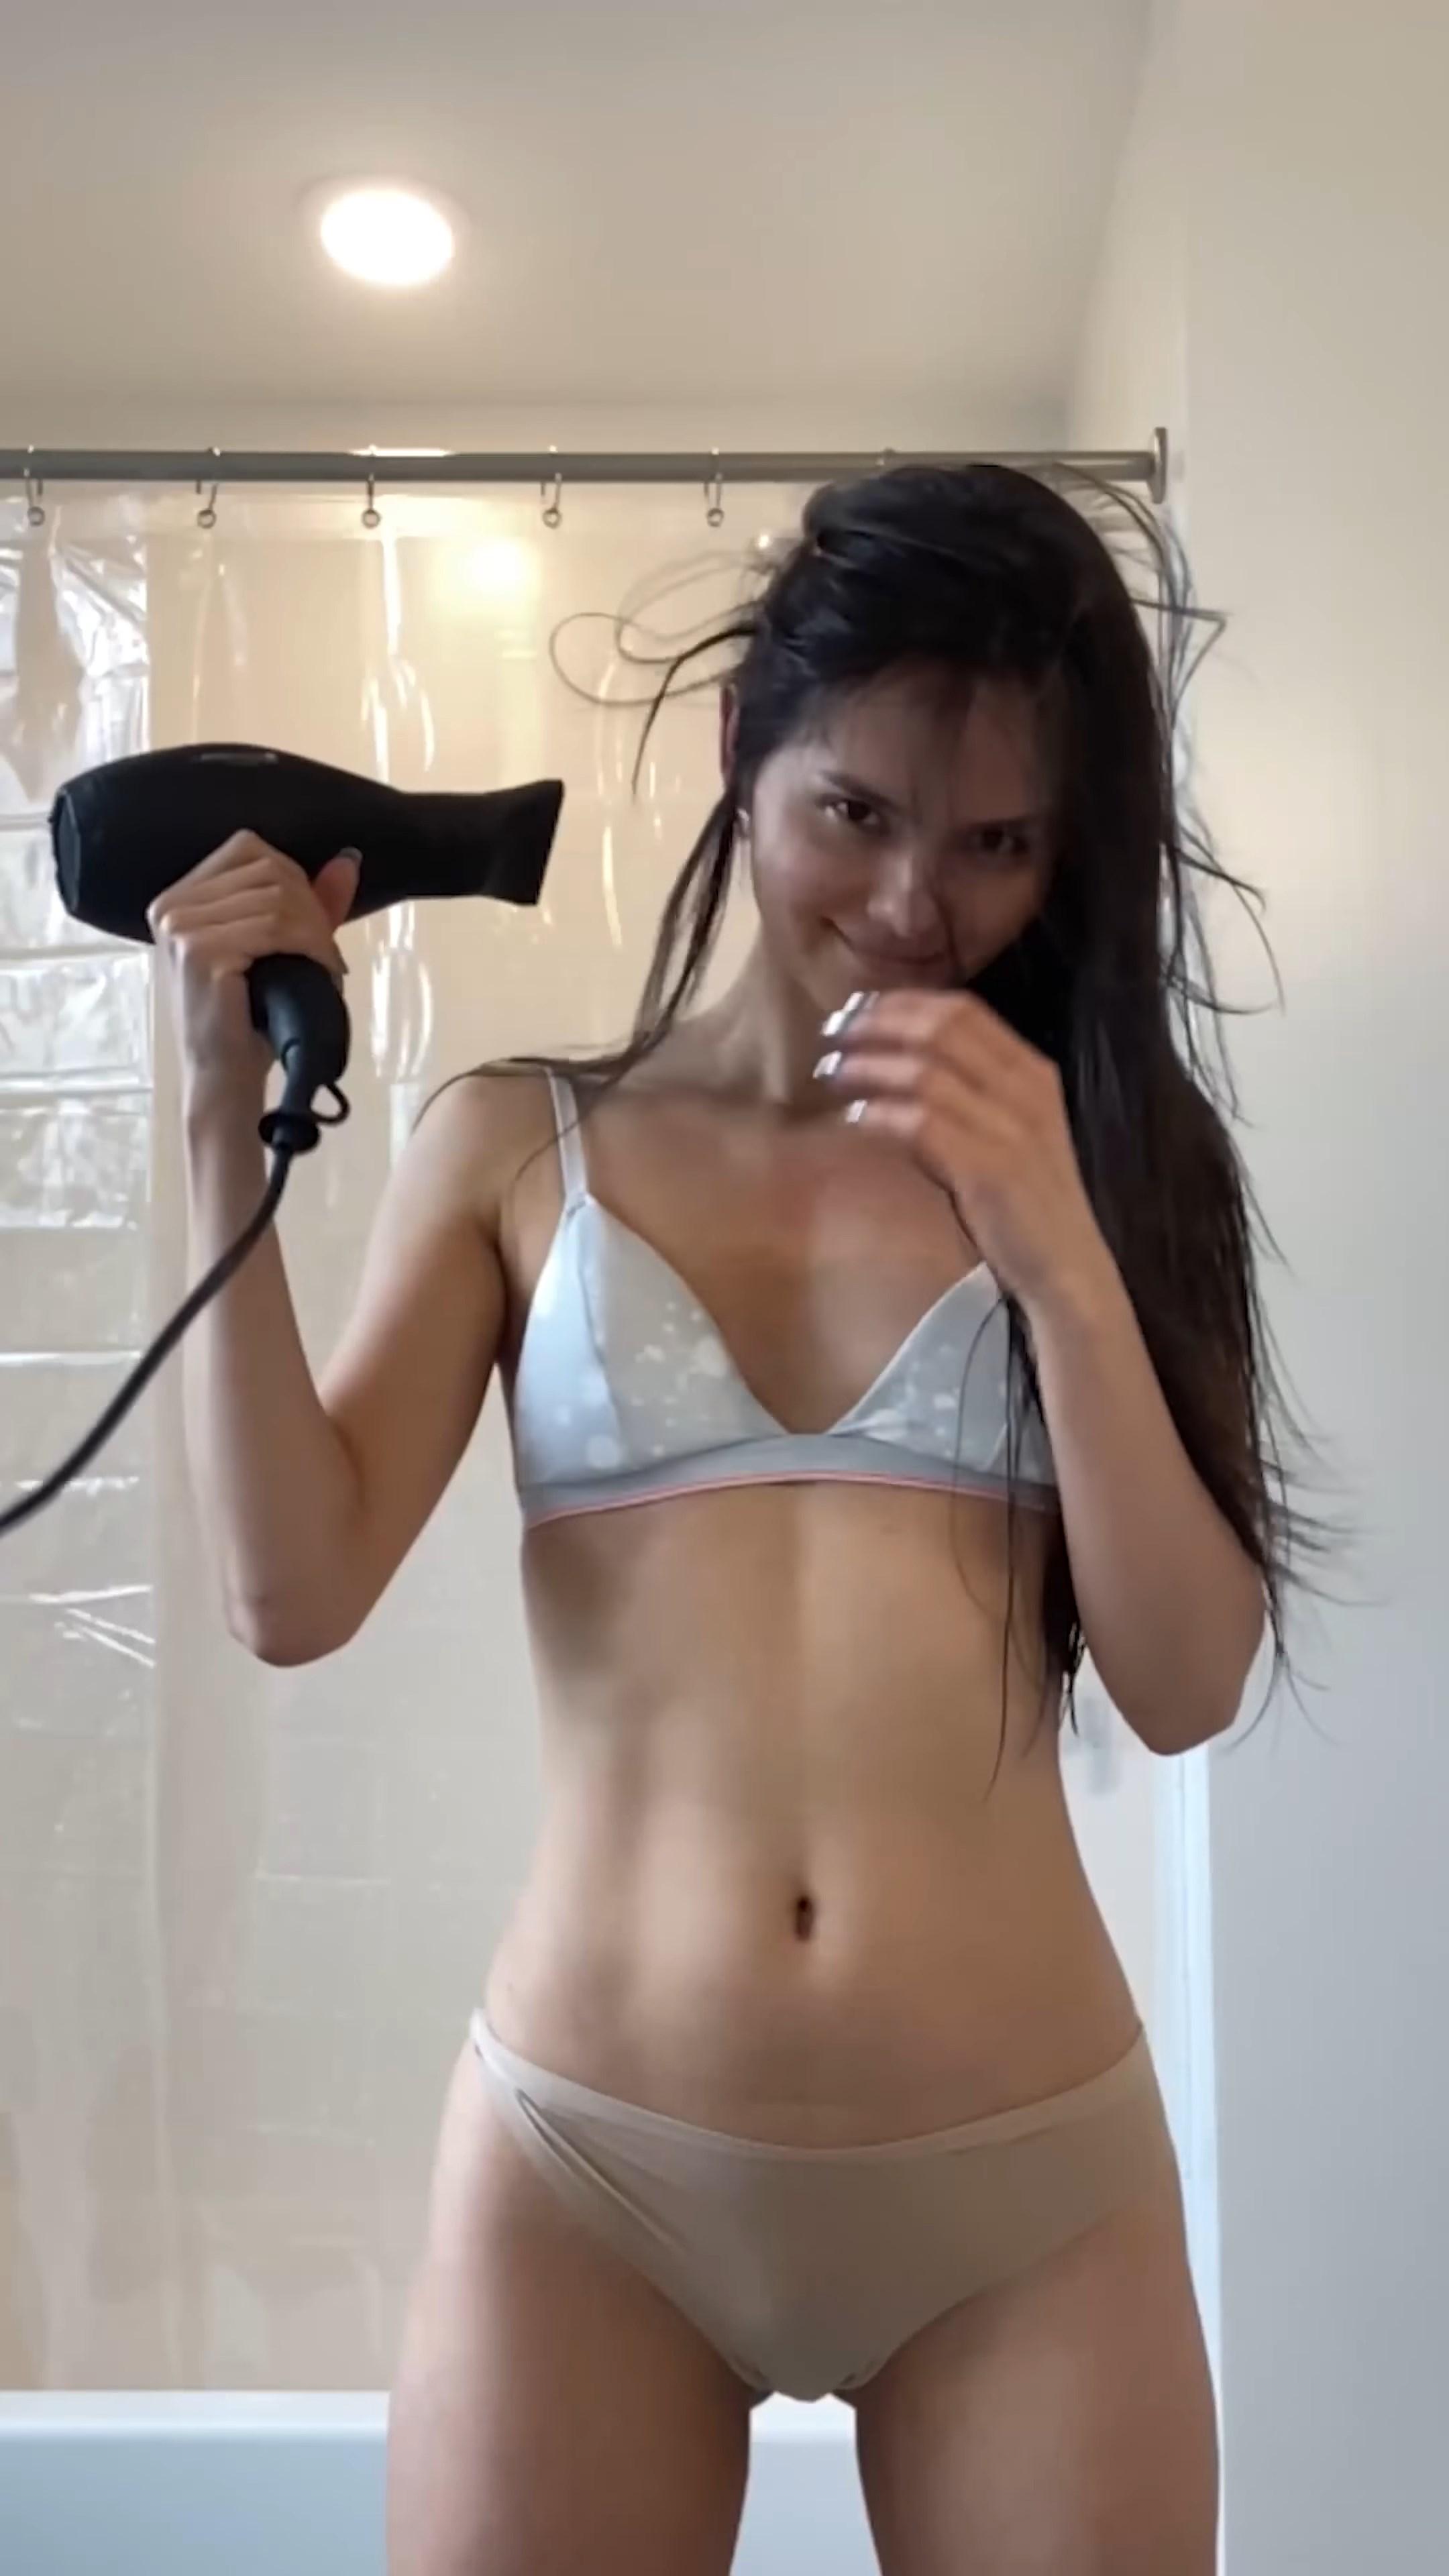 Quarantine hair by me and blow dryer dance ????????????.mkv_snapshot_00.30_[2020.07.24_00.54.26].jpg